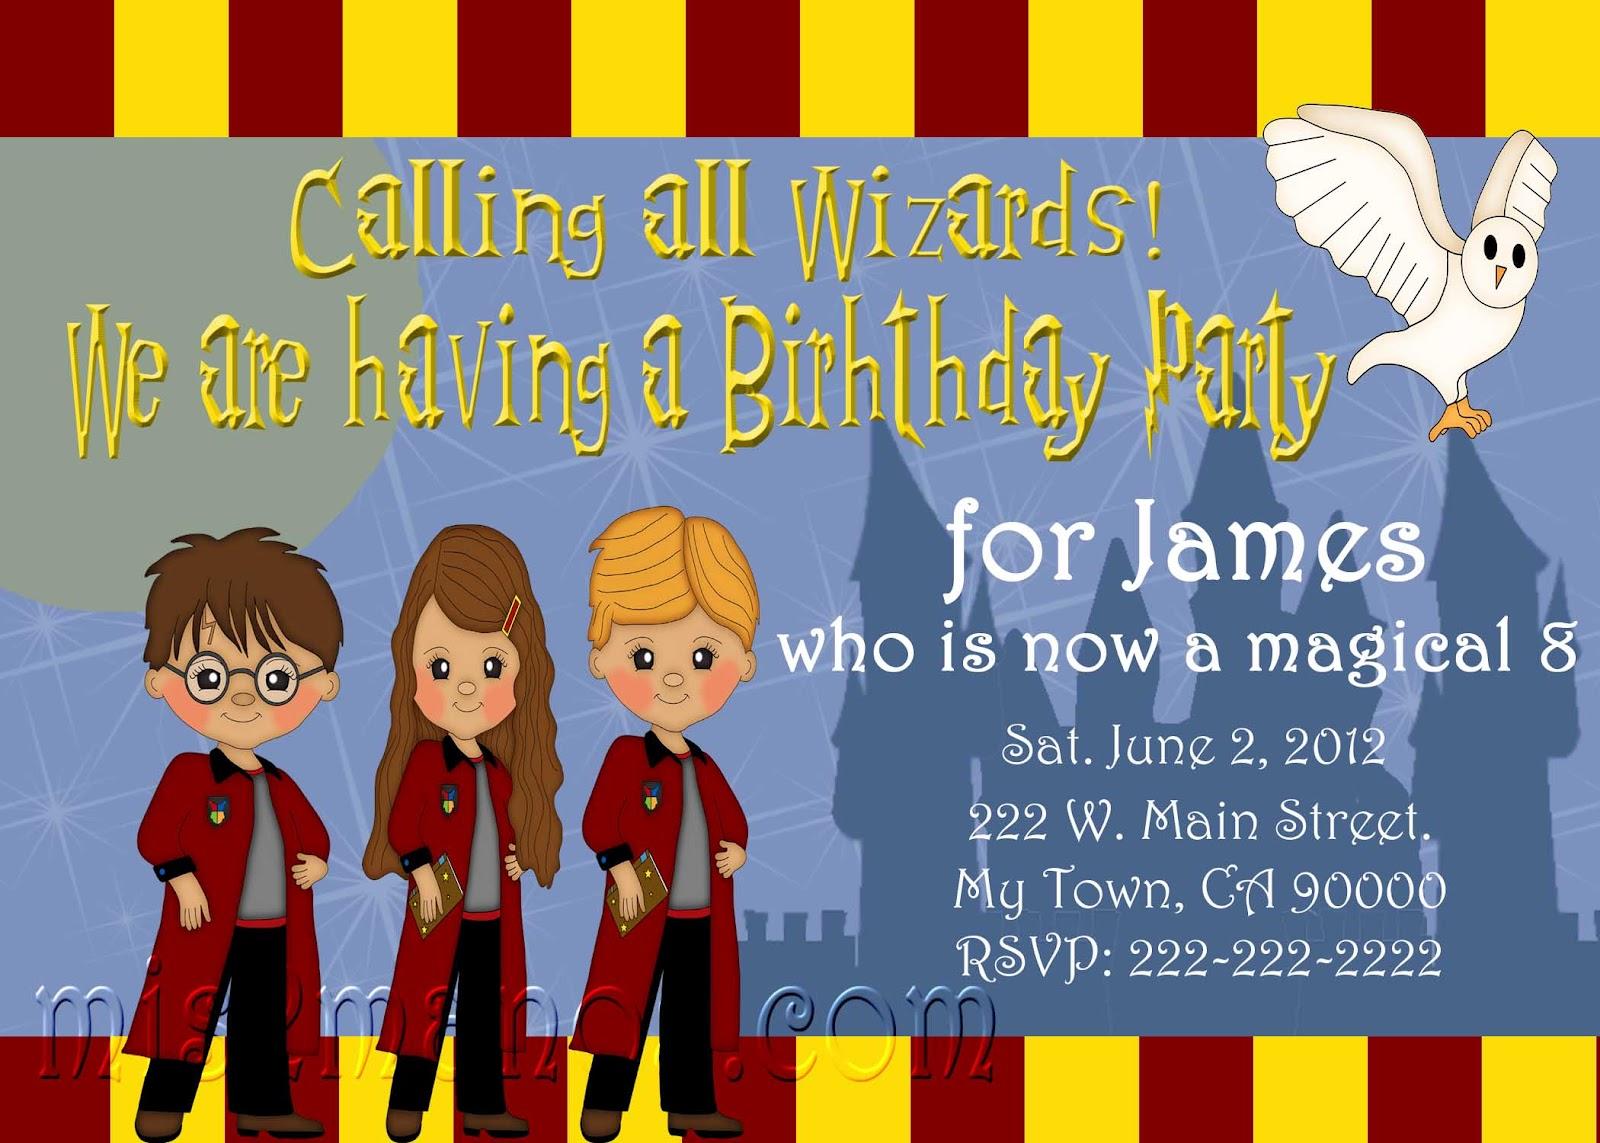 Wizard Birthday Invitations School Of Wizardry Party Invitation Printable Harry Potter Inspired Jpg 1600x1143